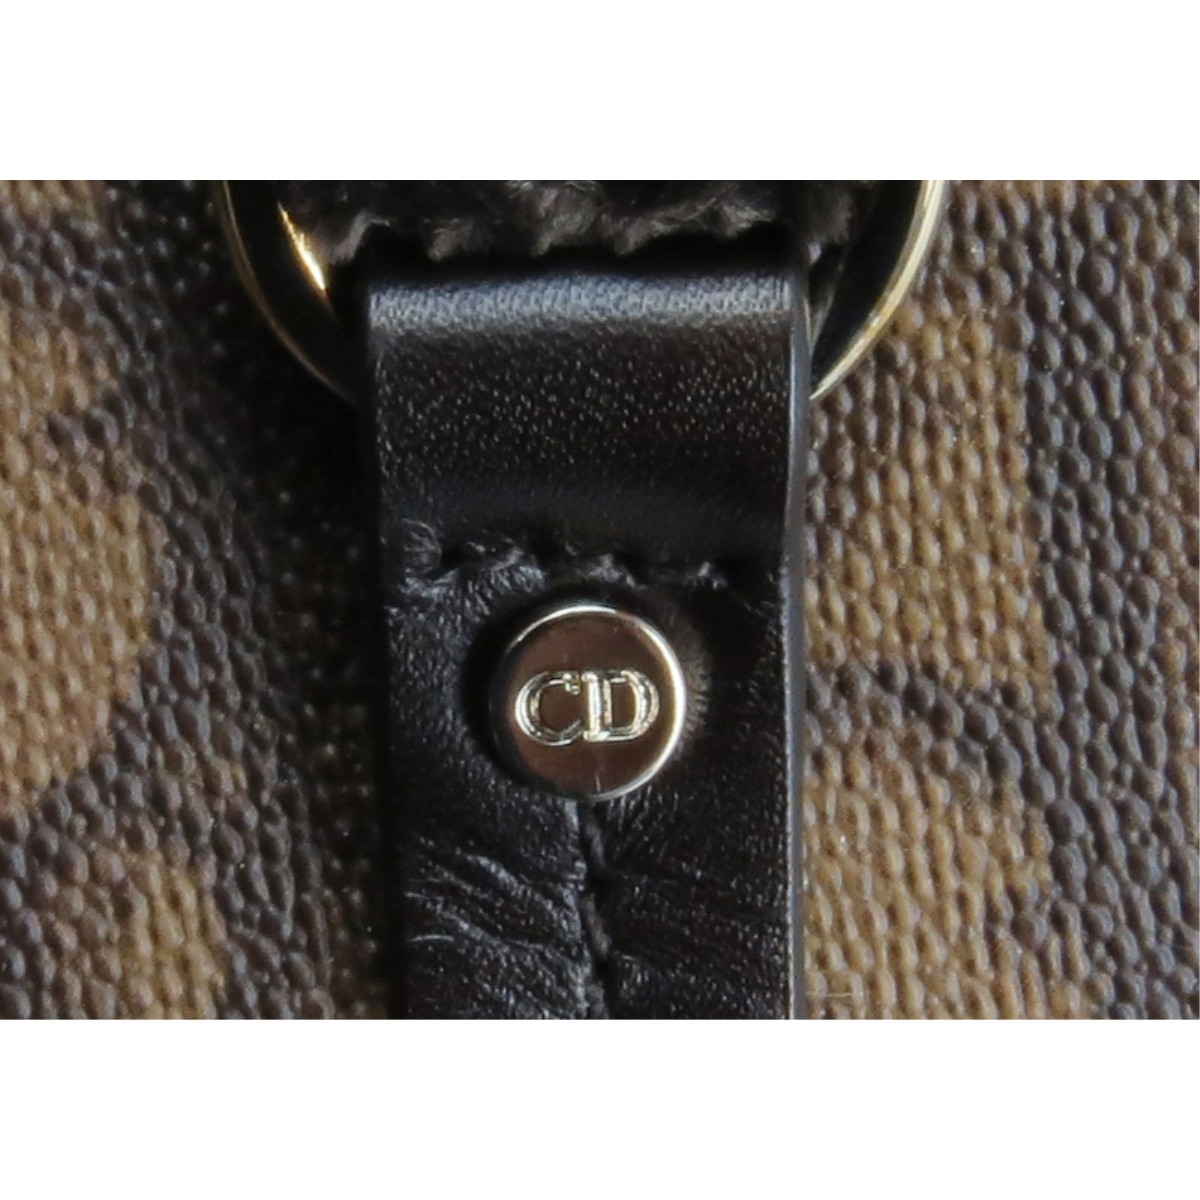 Lot 289 - Christian Dior Monogram Romantique Trotter Handbag